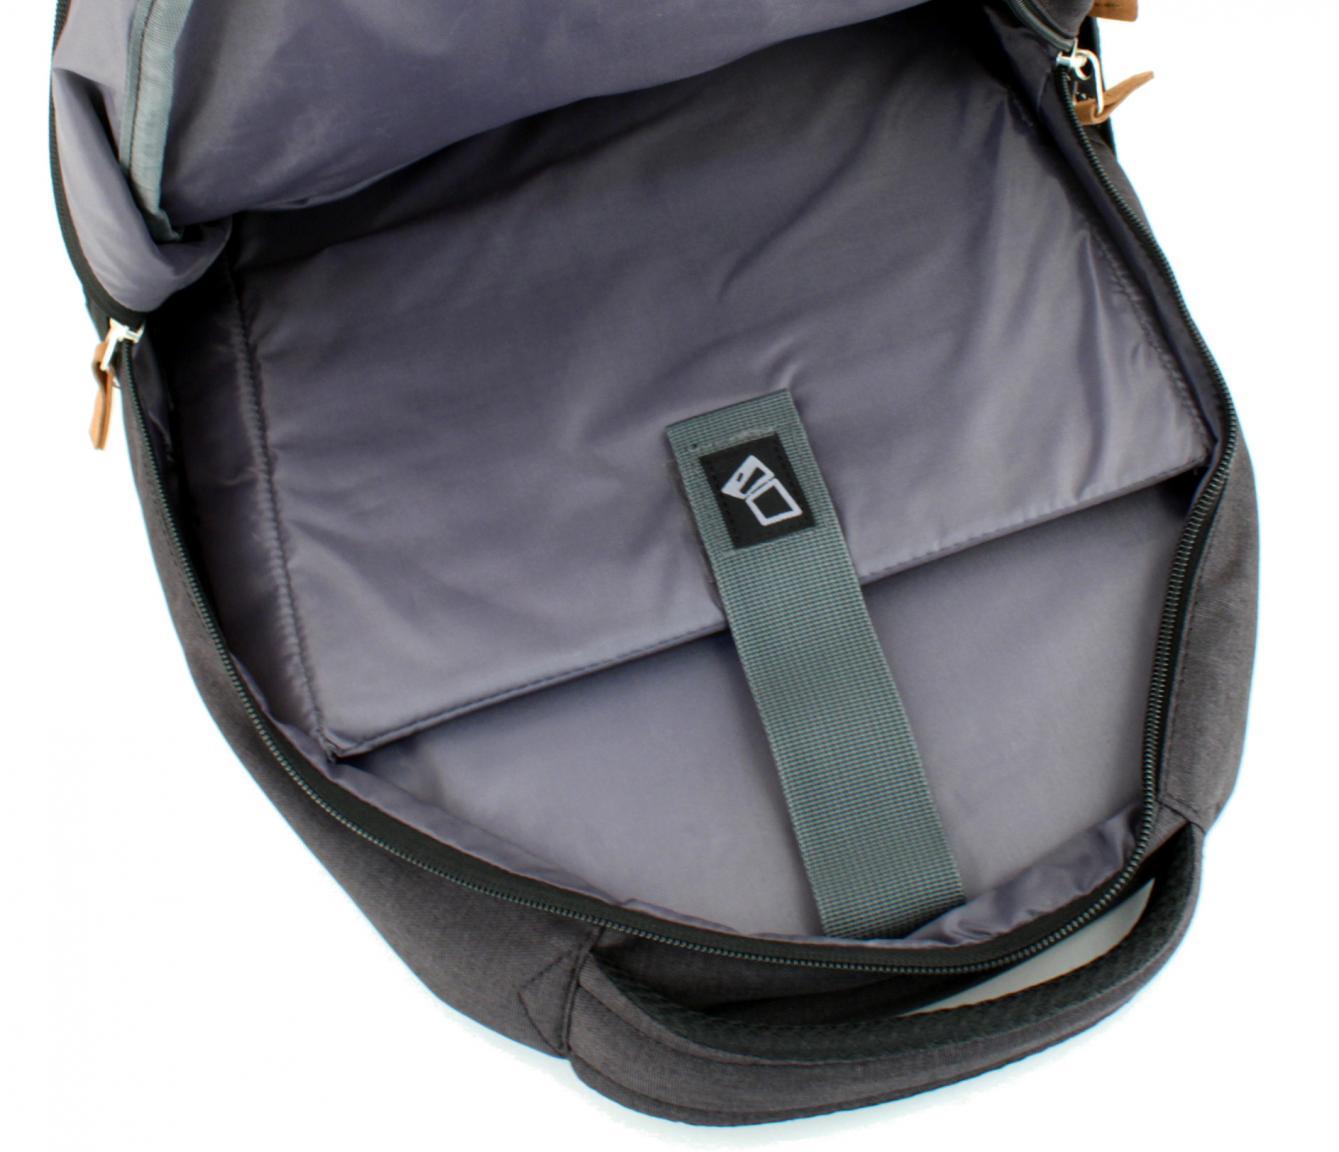 travelite rucksack neopak laptopfach marine blau bags more. Black Bedroom Furniture Sets. Home Design Ideas